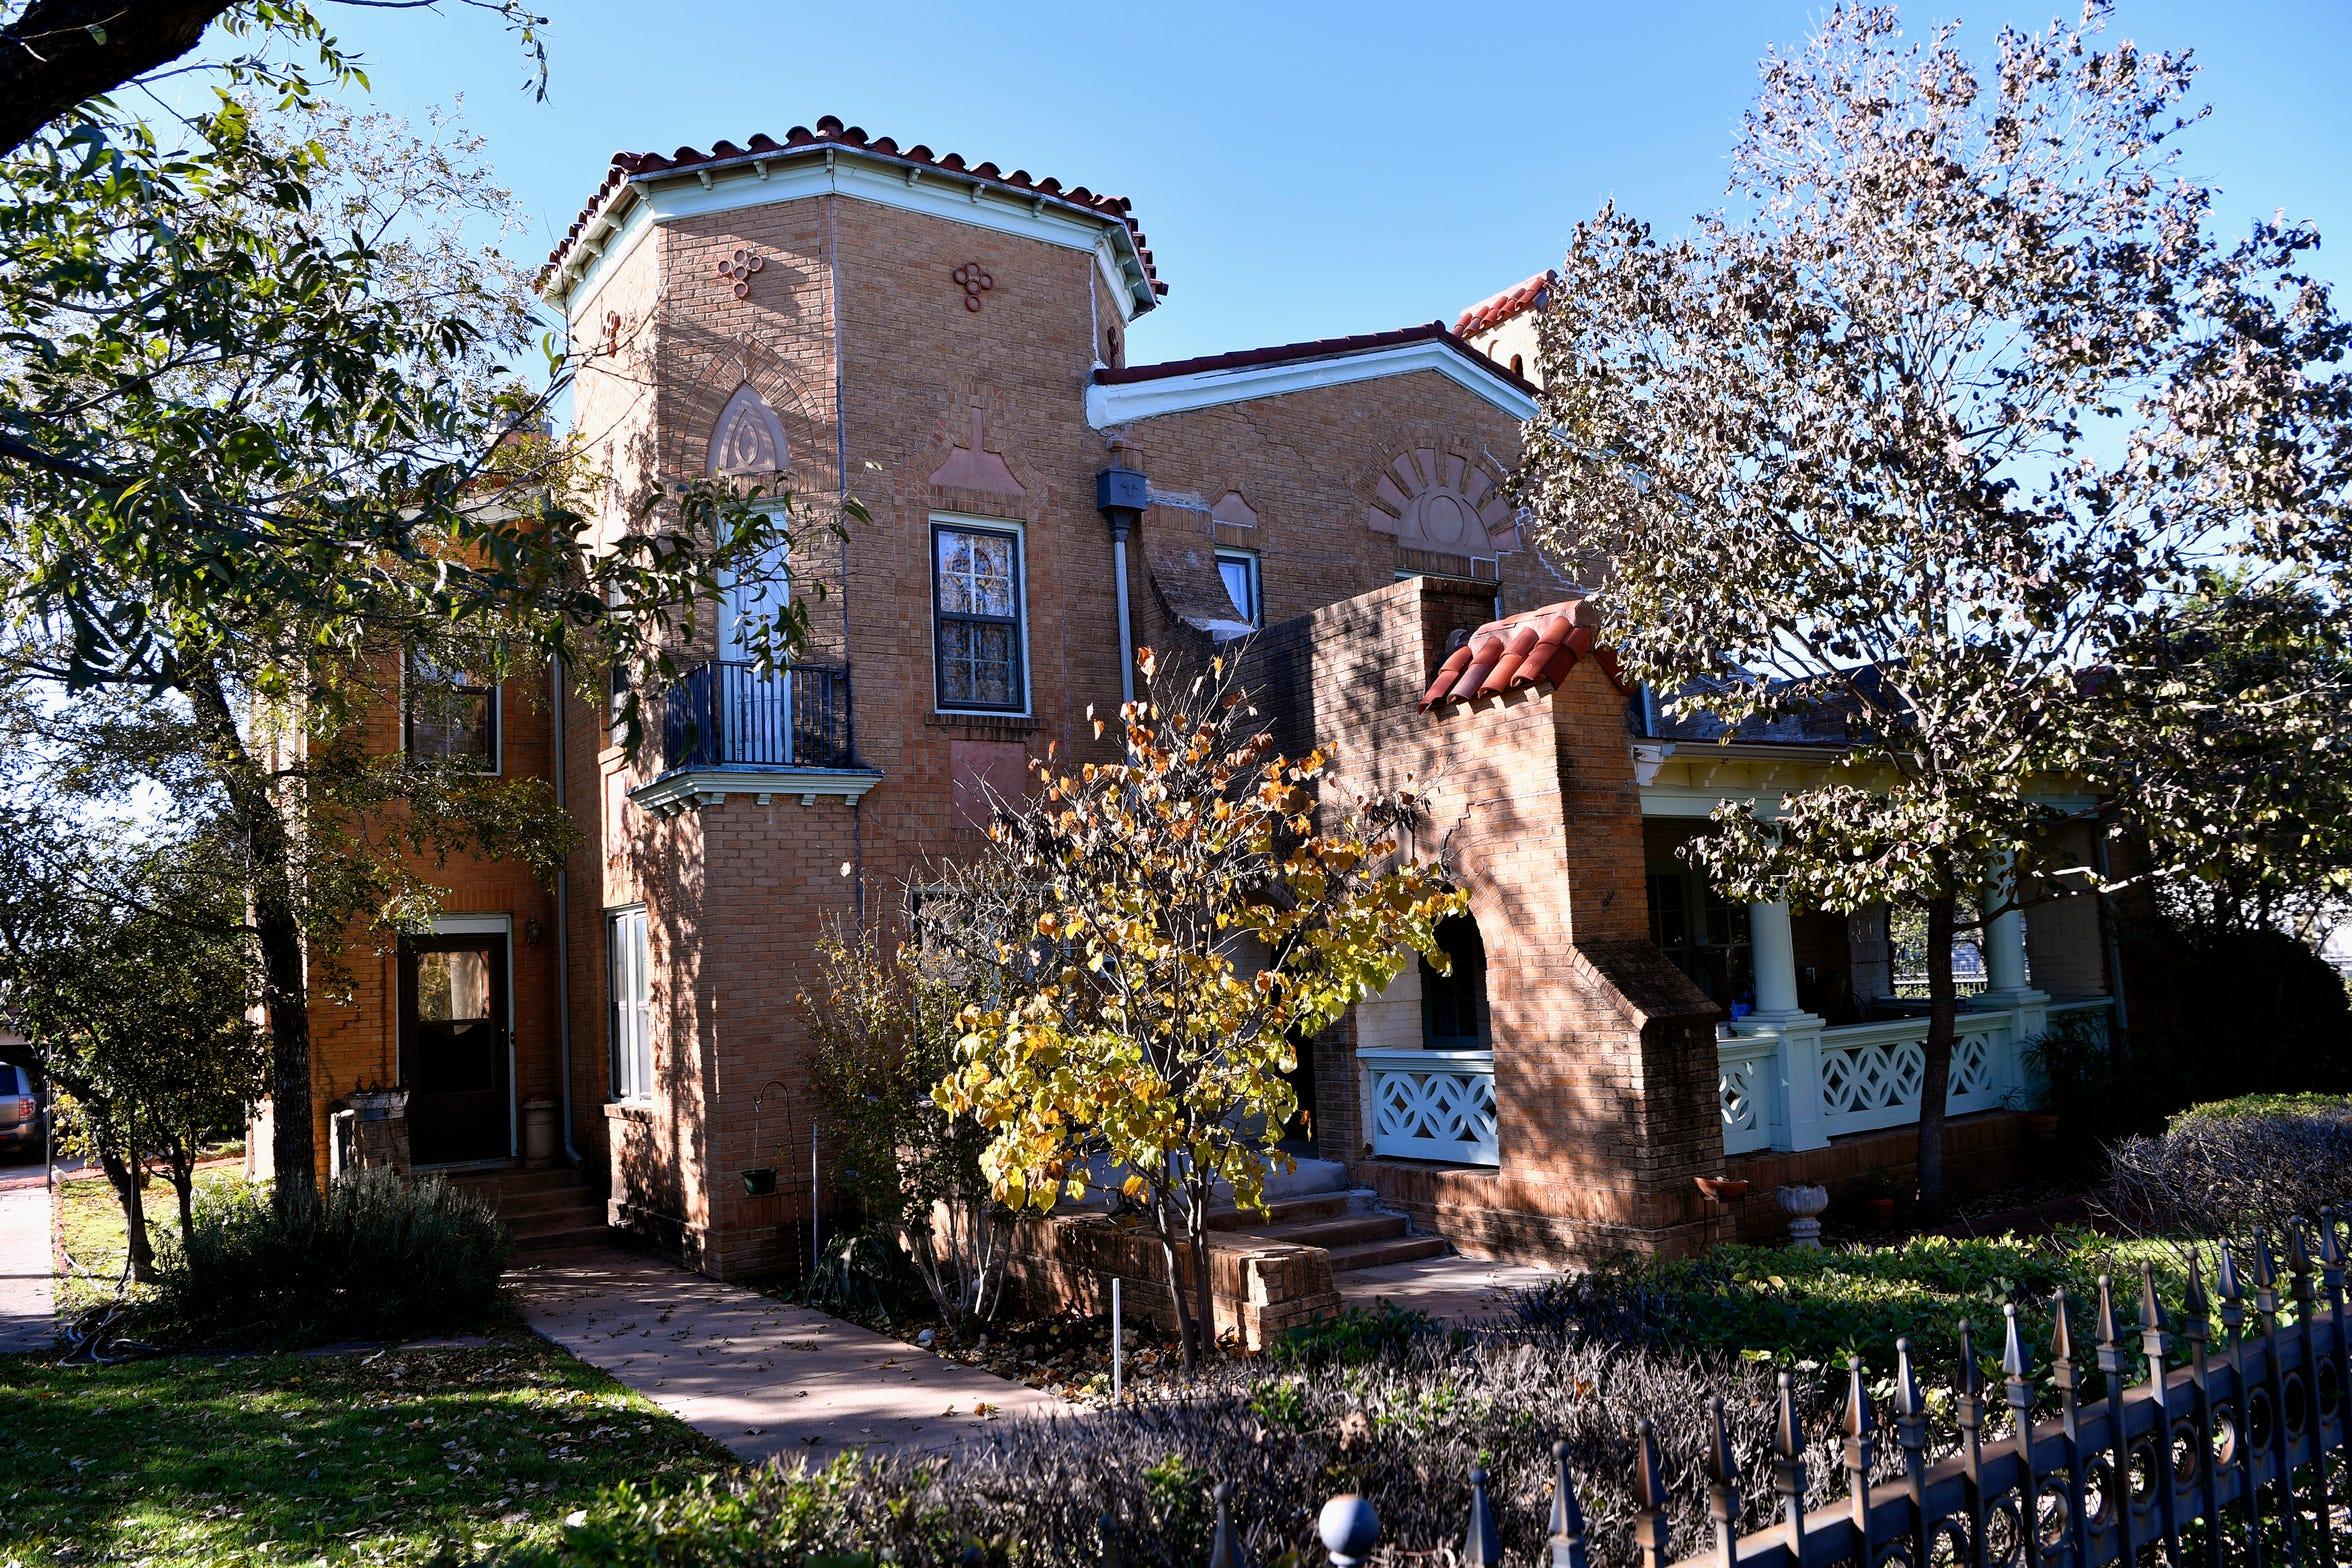 The home at 2102 Swenson Street, designed by Abilene architect David Castle.